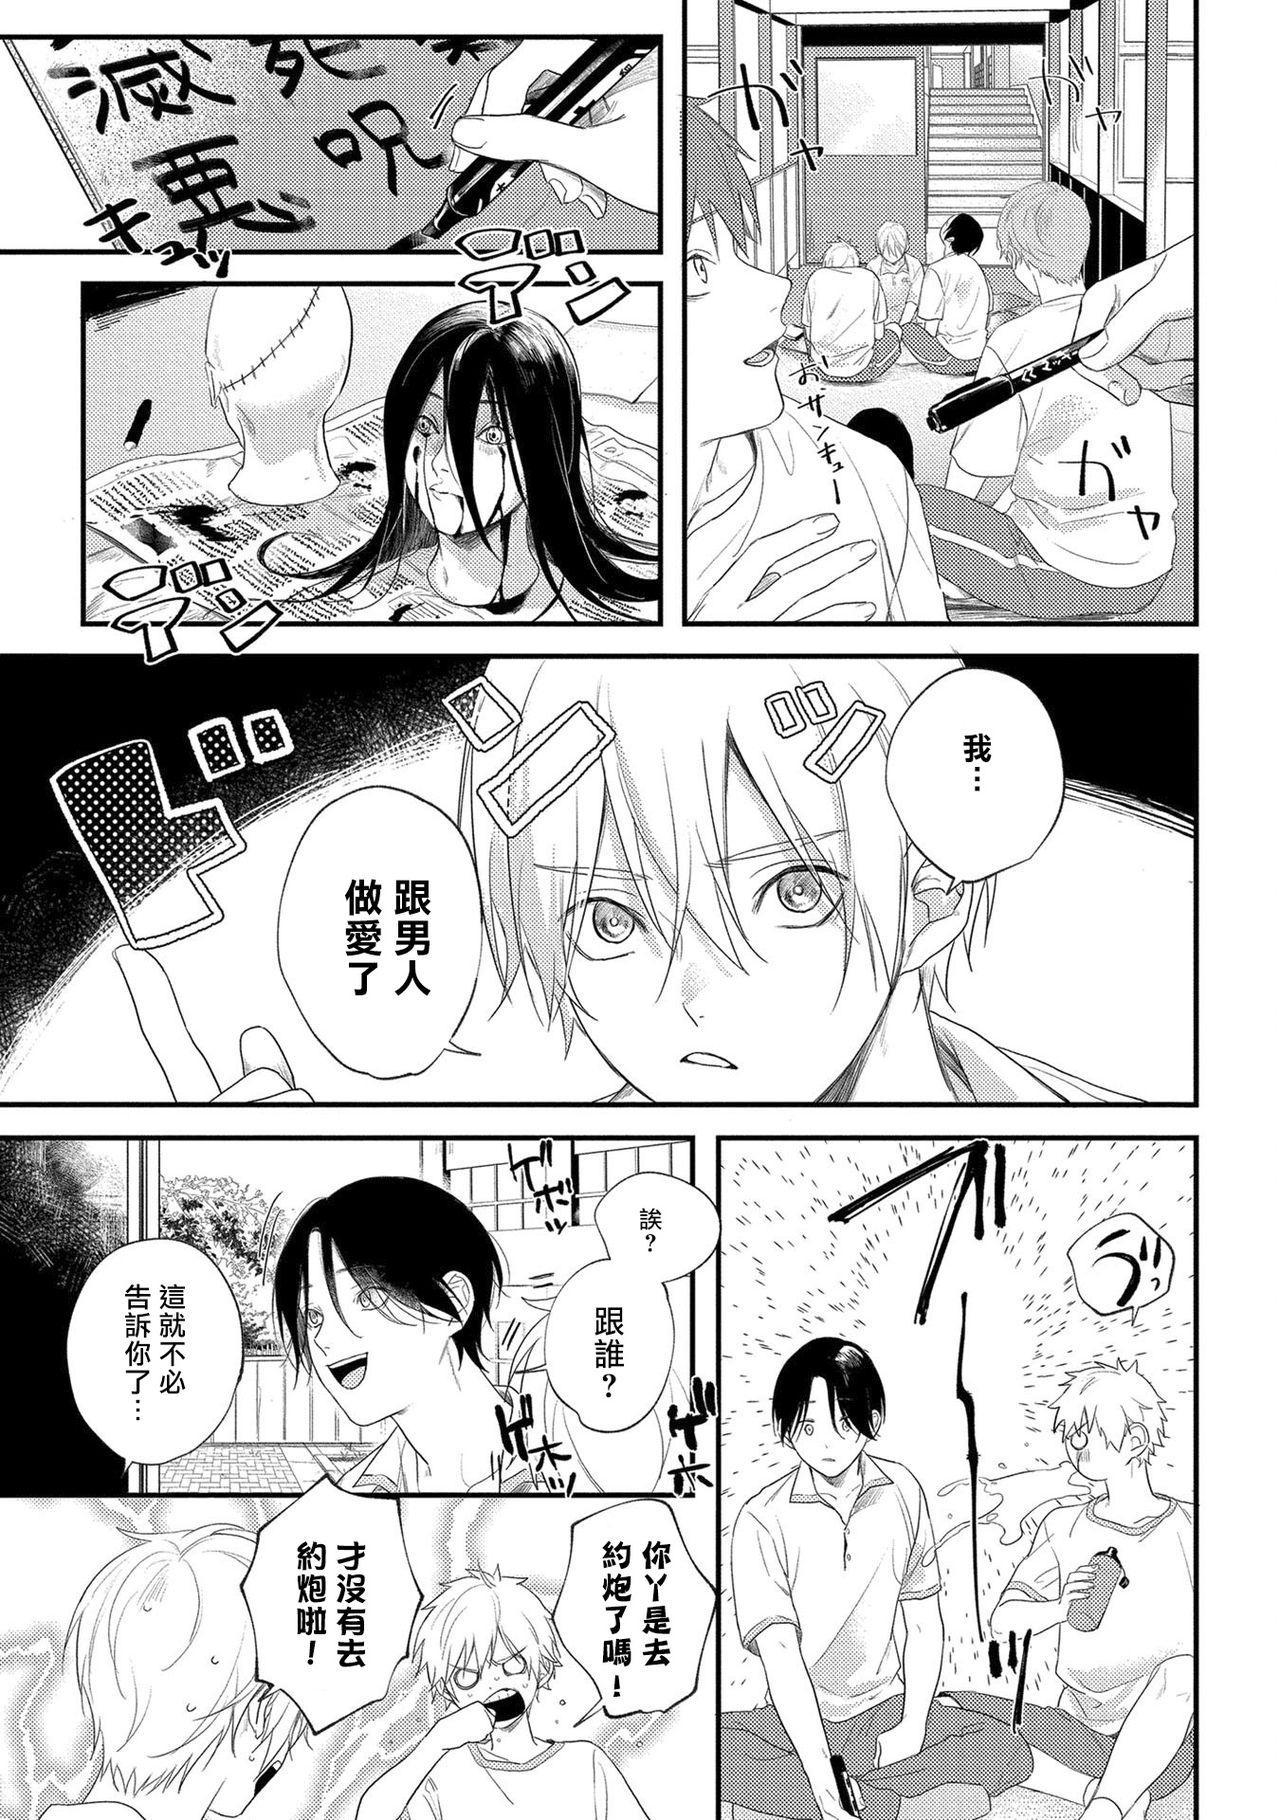 [Utata Hakuto] Houkago Virginity - Virginity afterschool 1-3 [Chinese] [拾荒者汉化组] [Digital] 35